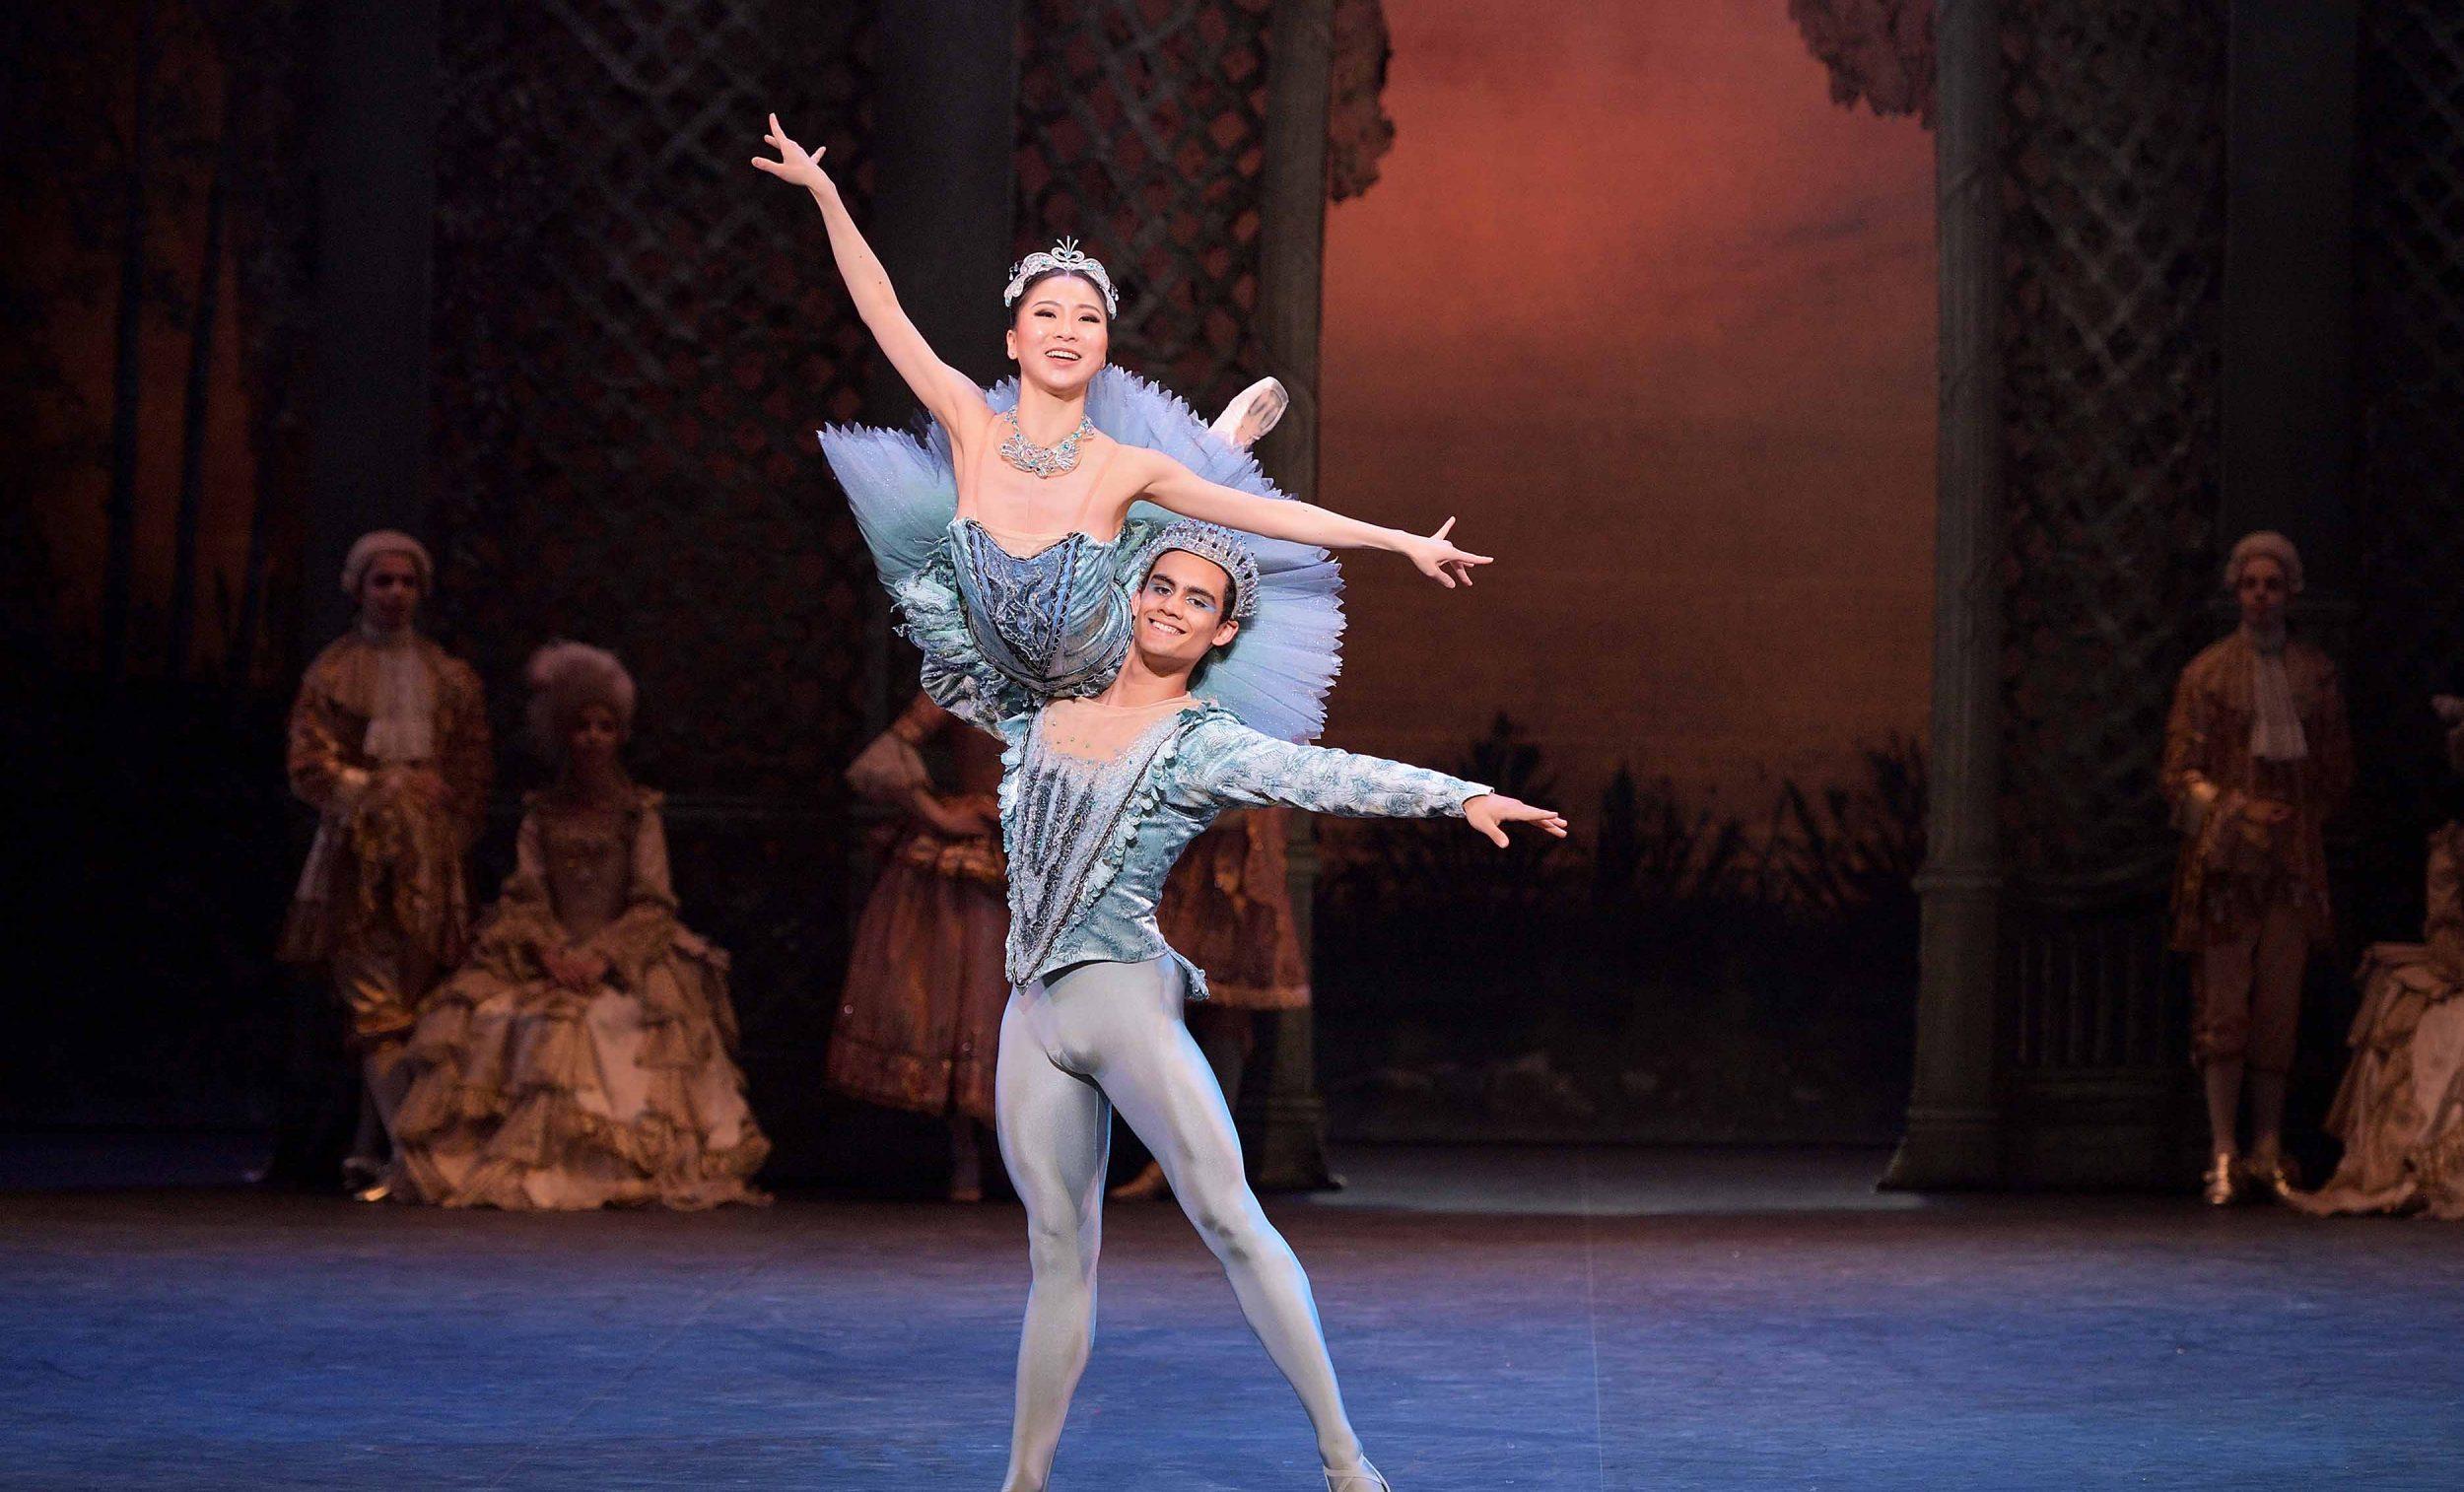 Daniel-McCormick-as-The-Bluebird-and-Rina-Kanehara-as-Princess-Florine-in-The-Sleeping-Beauty-©-Laurent-Liotardo-(1)_WEB